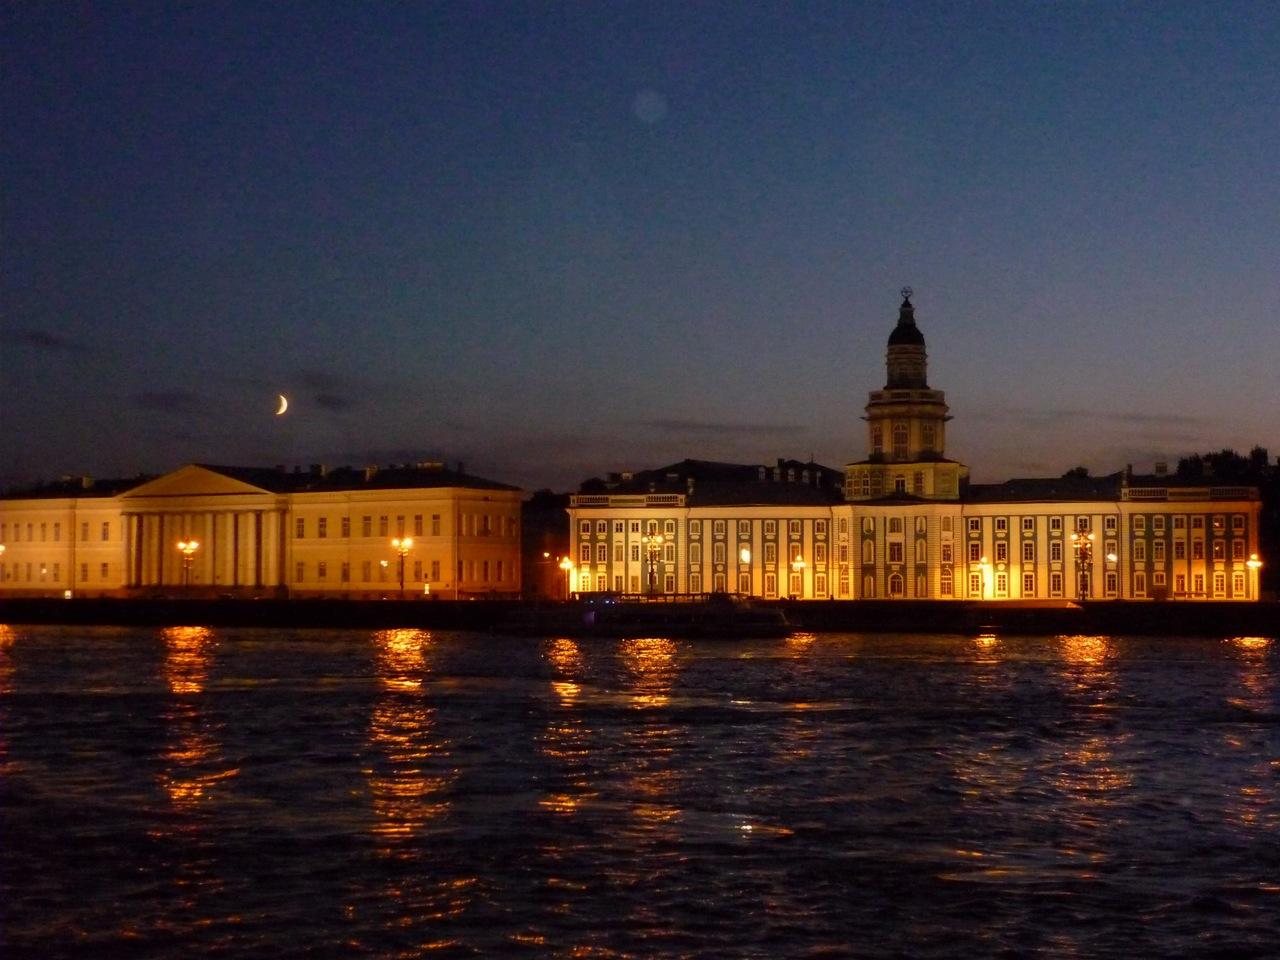 Кунсткамера ночью. Ольга Жиганова https://commons.wikimedia.org